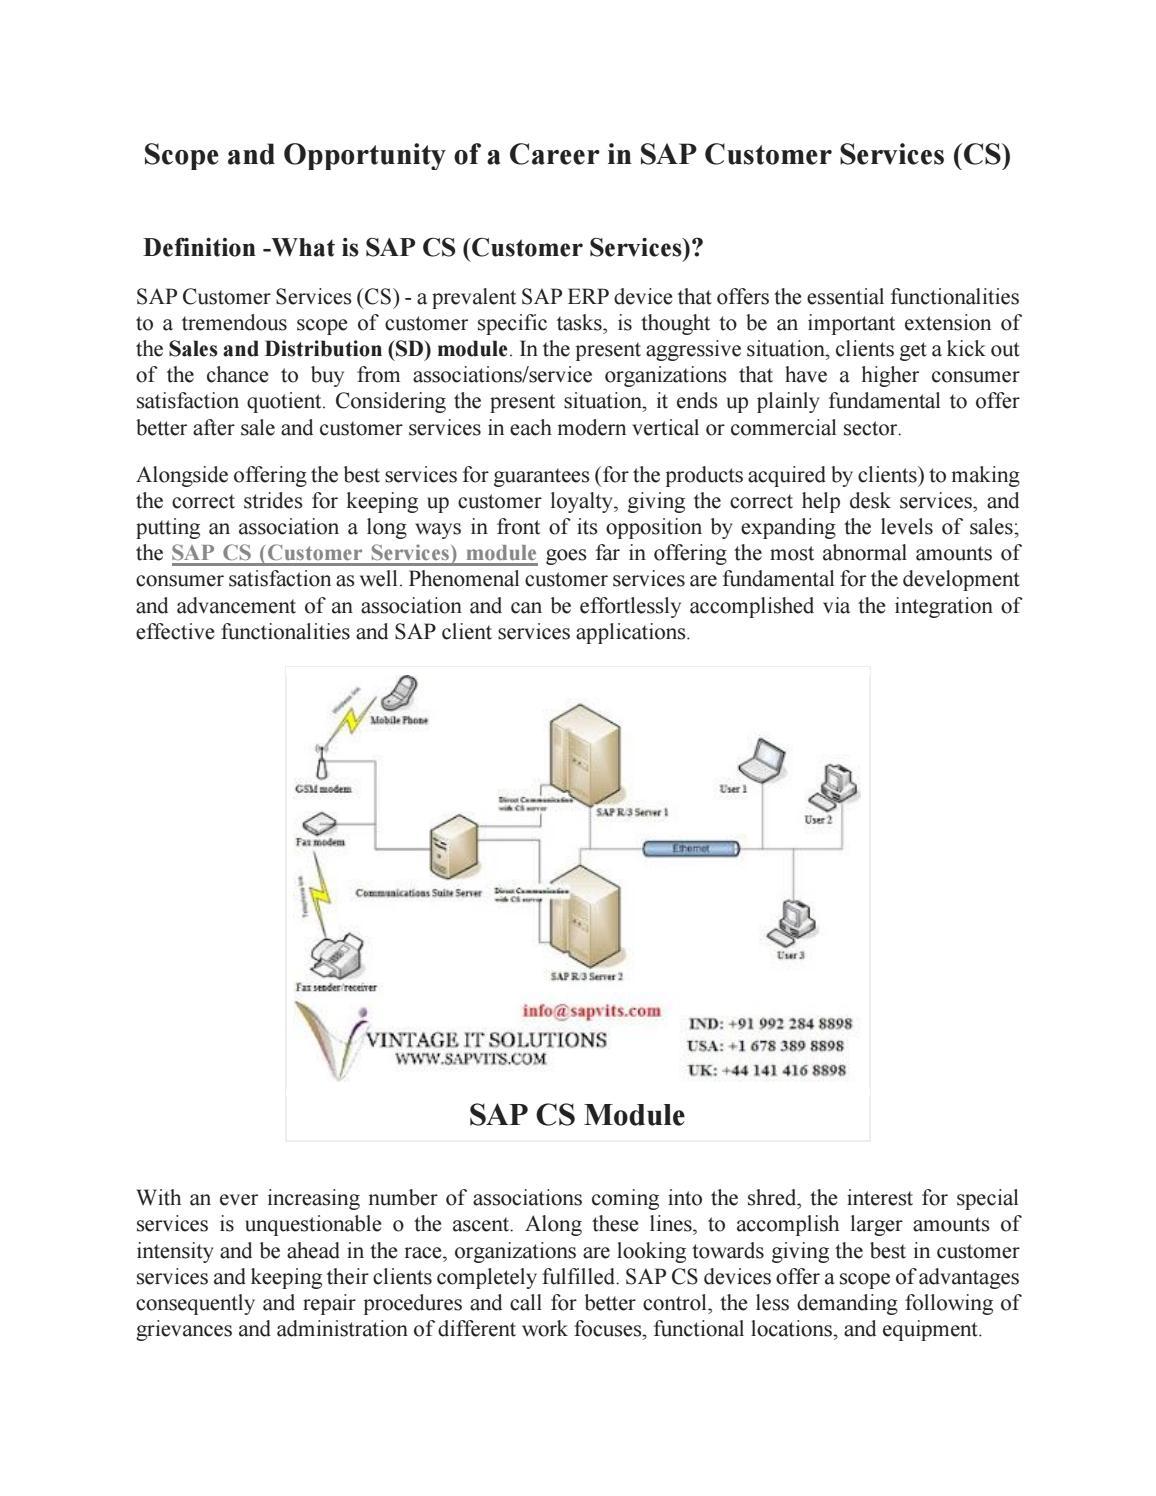 Sap customer service module pdf by sapvitskamini - issuu